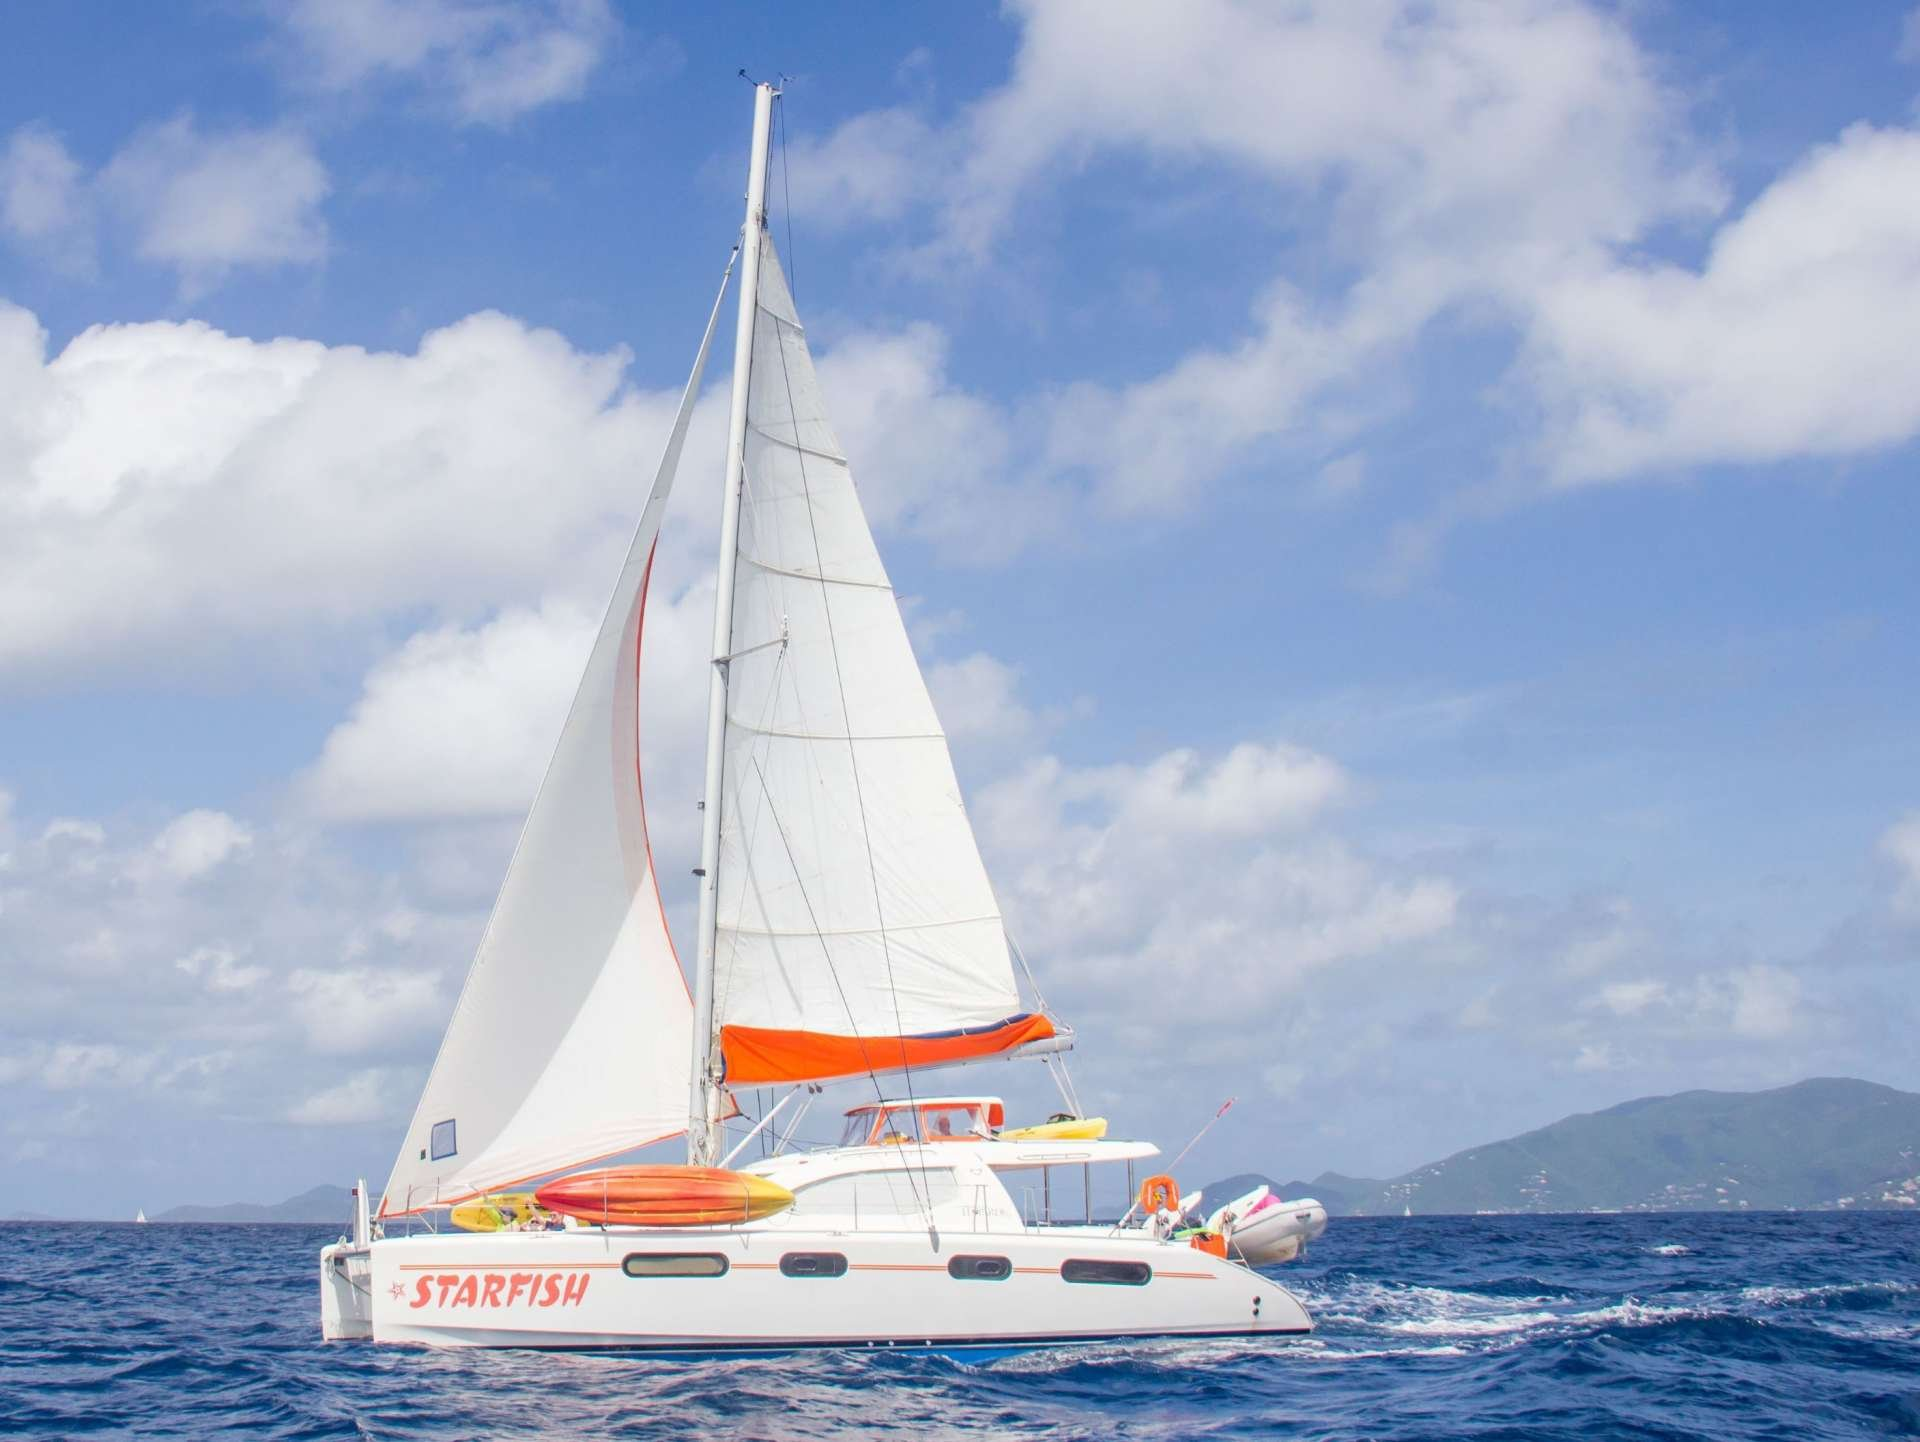 Catamaran Yacht 'STARFISH', 6 PAX, 2 Crew, 46.00 Ft, 14.00 Meters, Built 2008, Leopard, Refit Year 2019